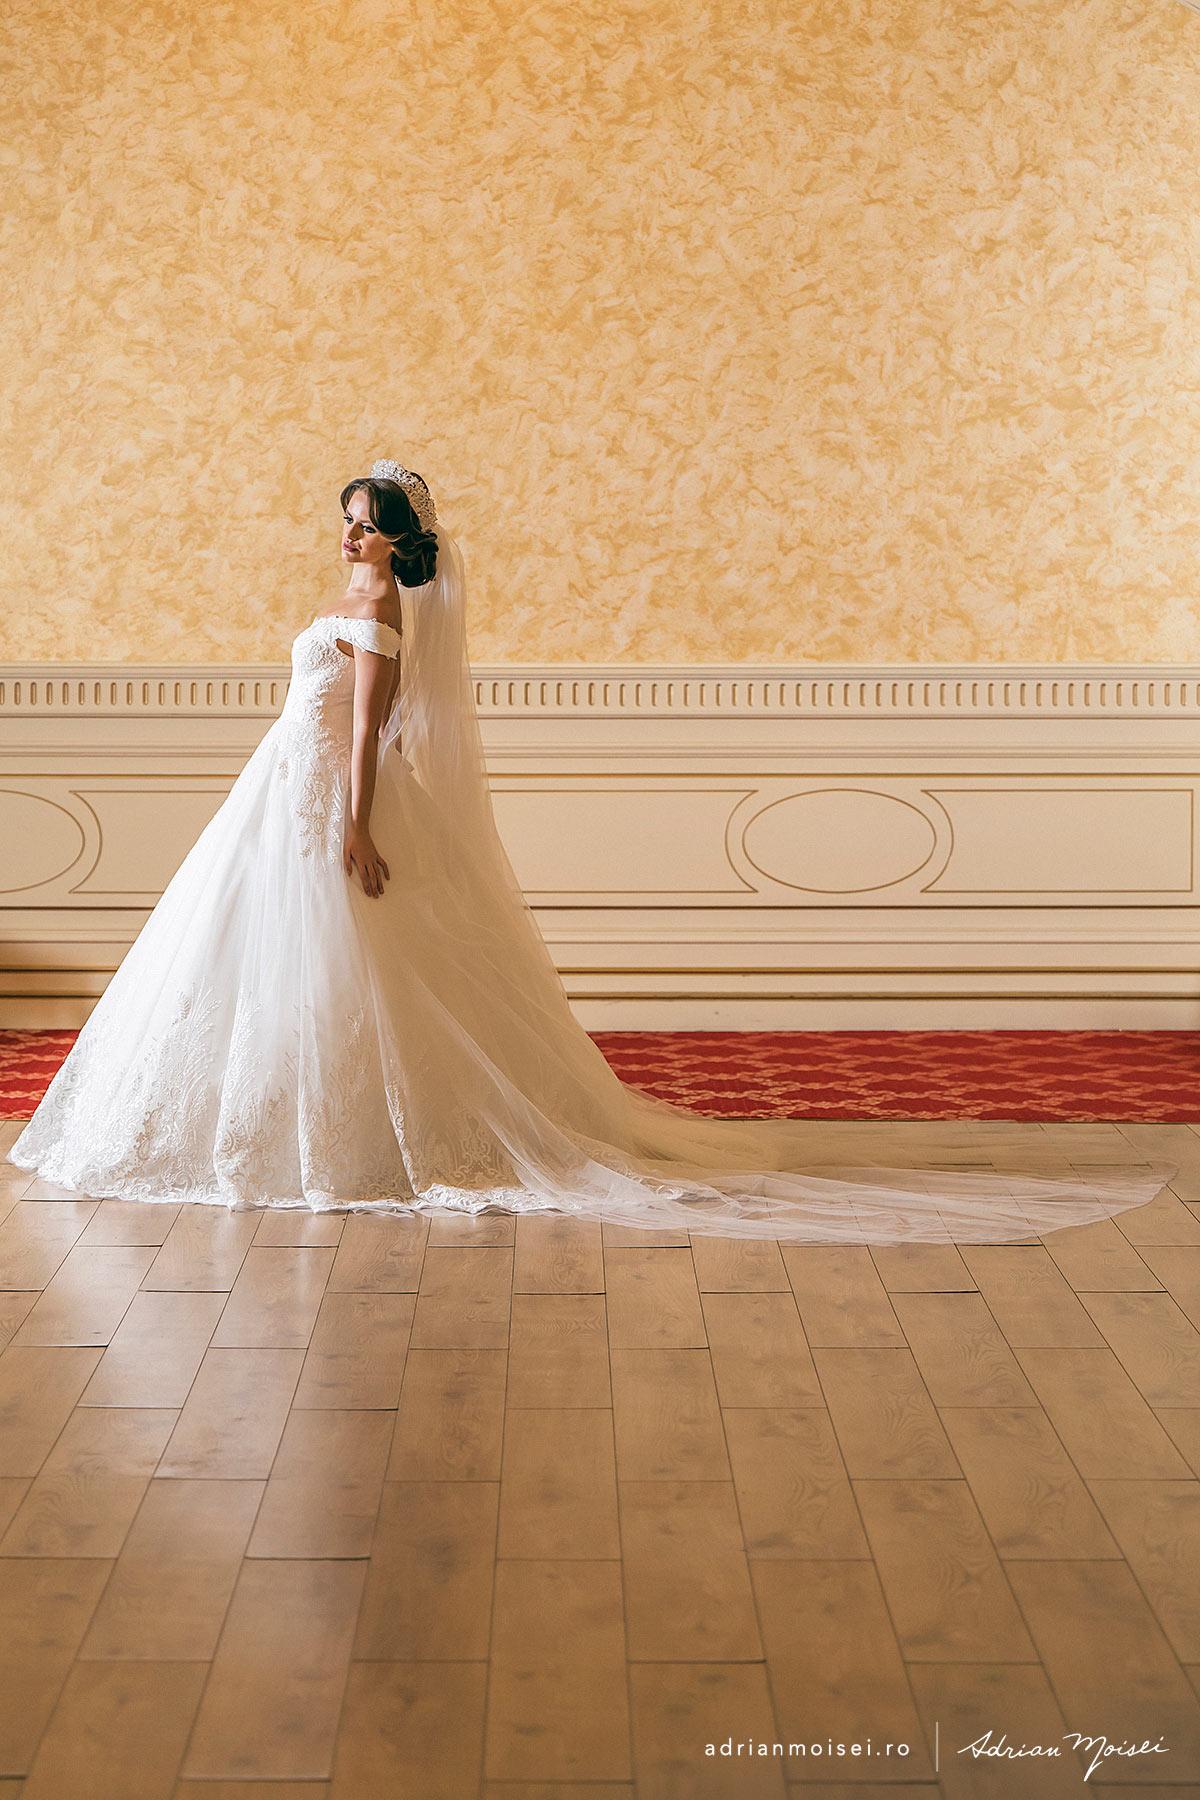 Sedinta foto alaturi de fotograf nunta Iasi- Adrian Moisei - studio foto-video.  Make-up, Hair, Dress, Locatie